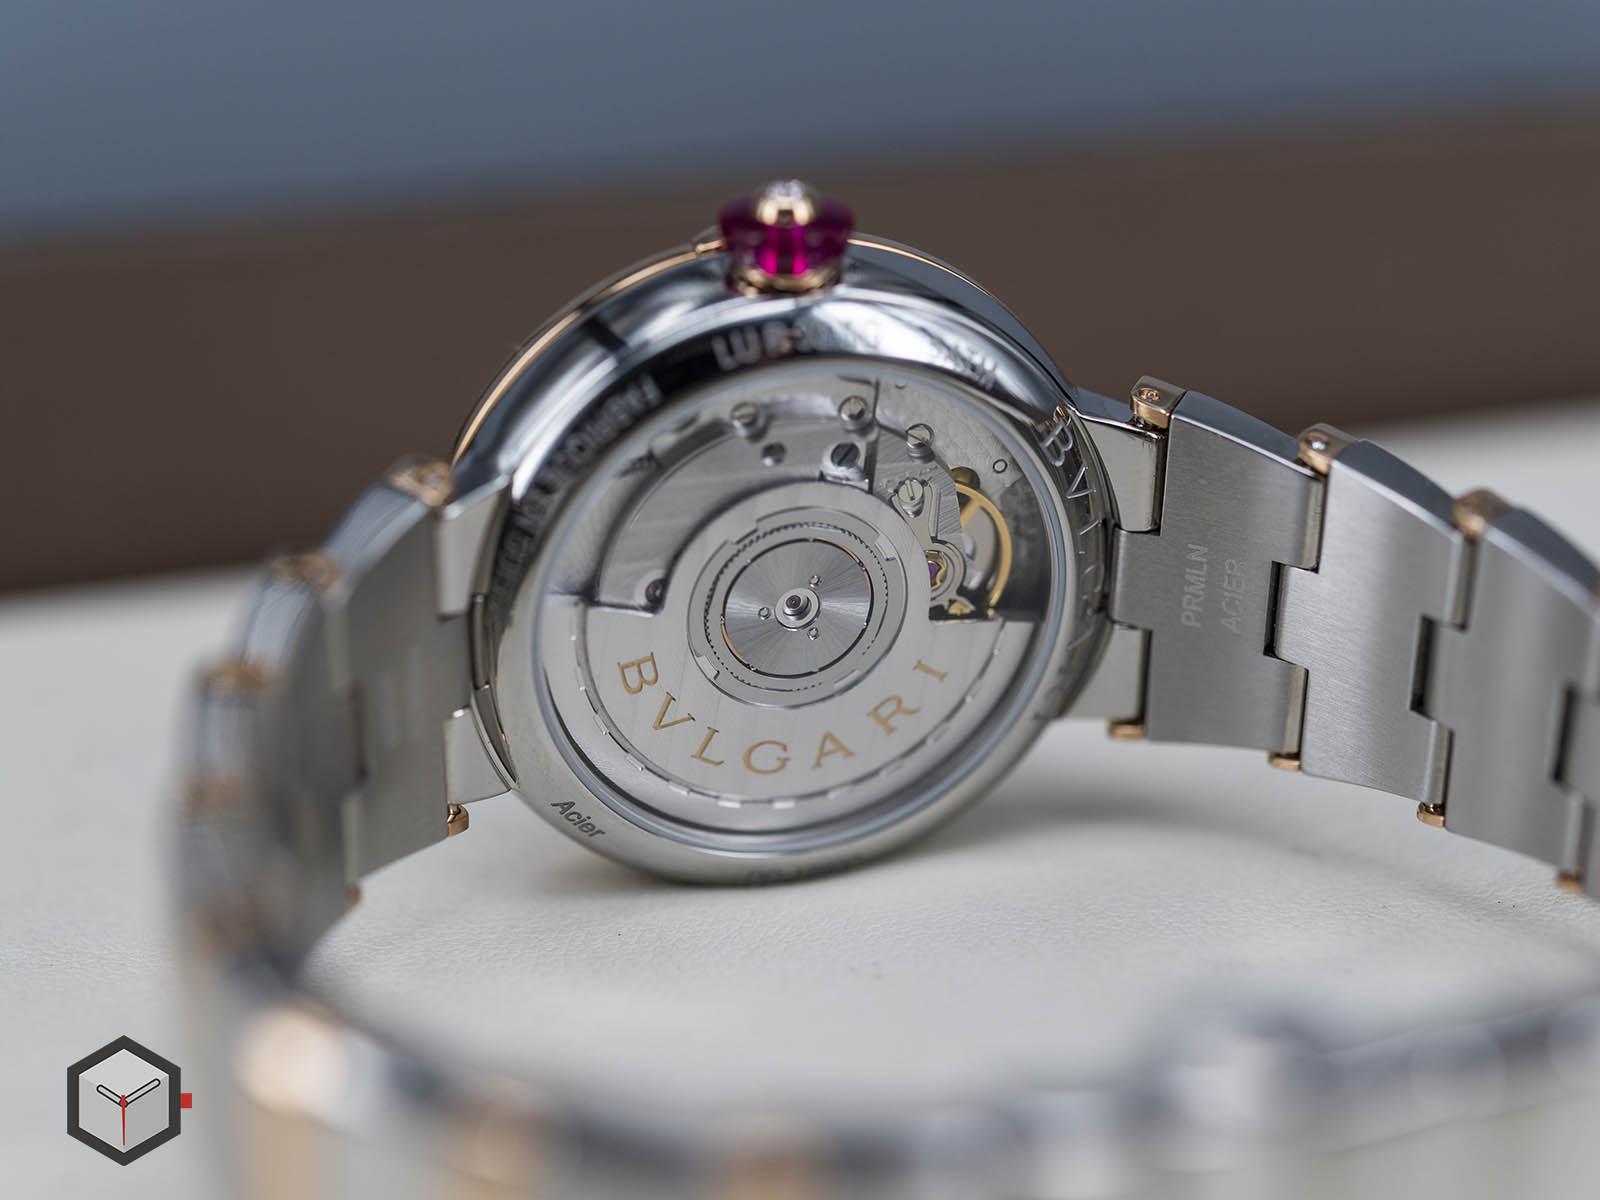 102980-bulgari-lvcea-automatic-stainless-steel-gold-9.jpg